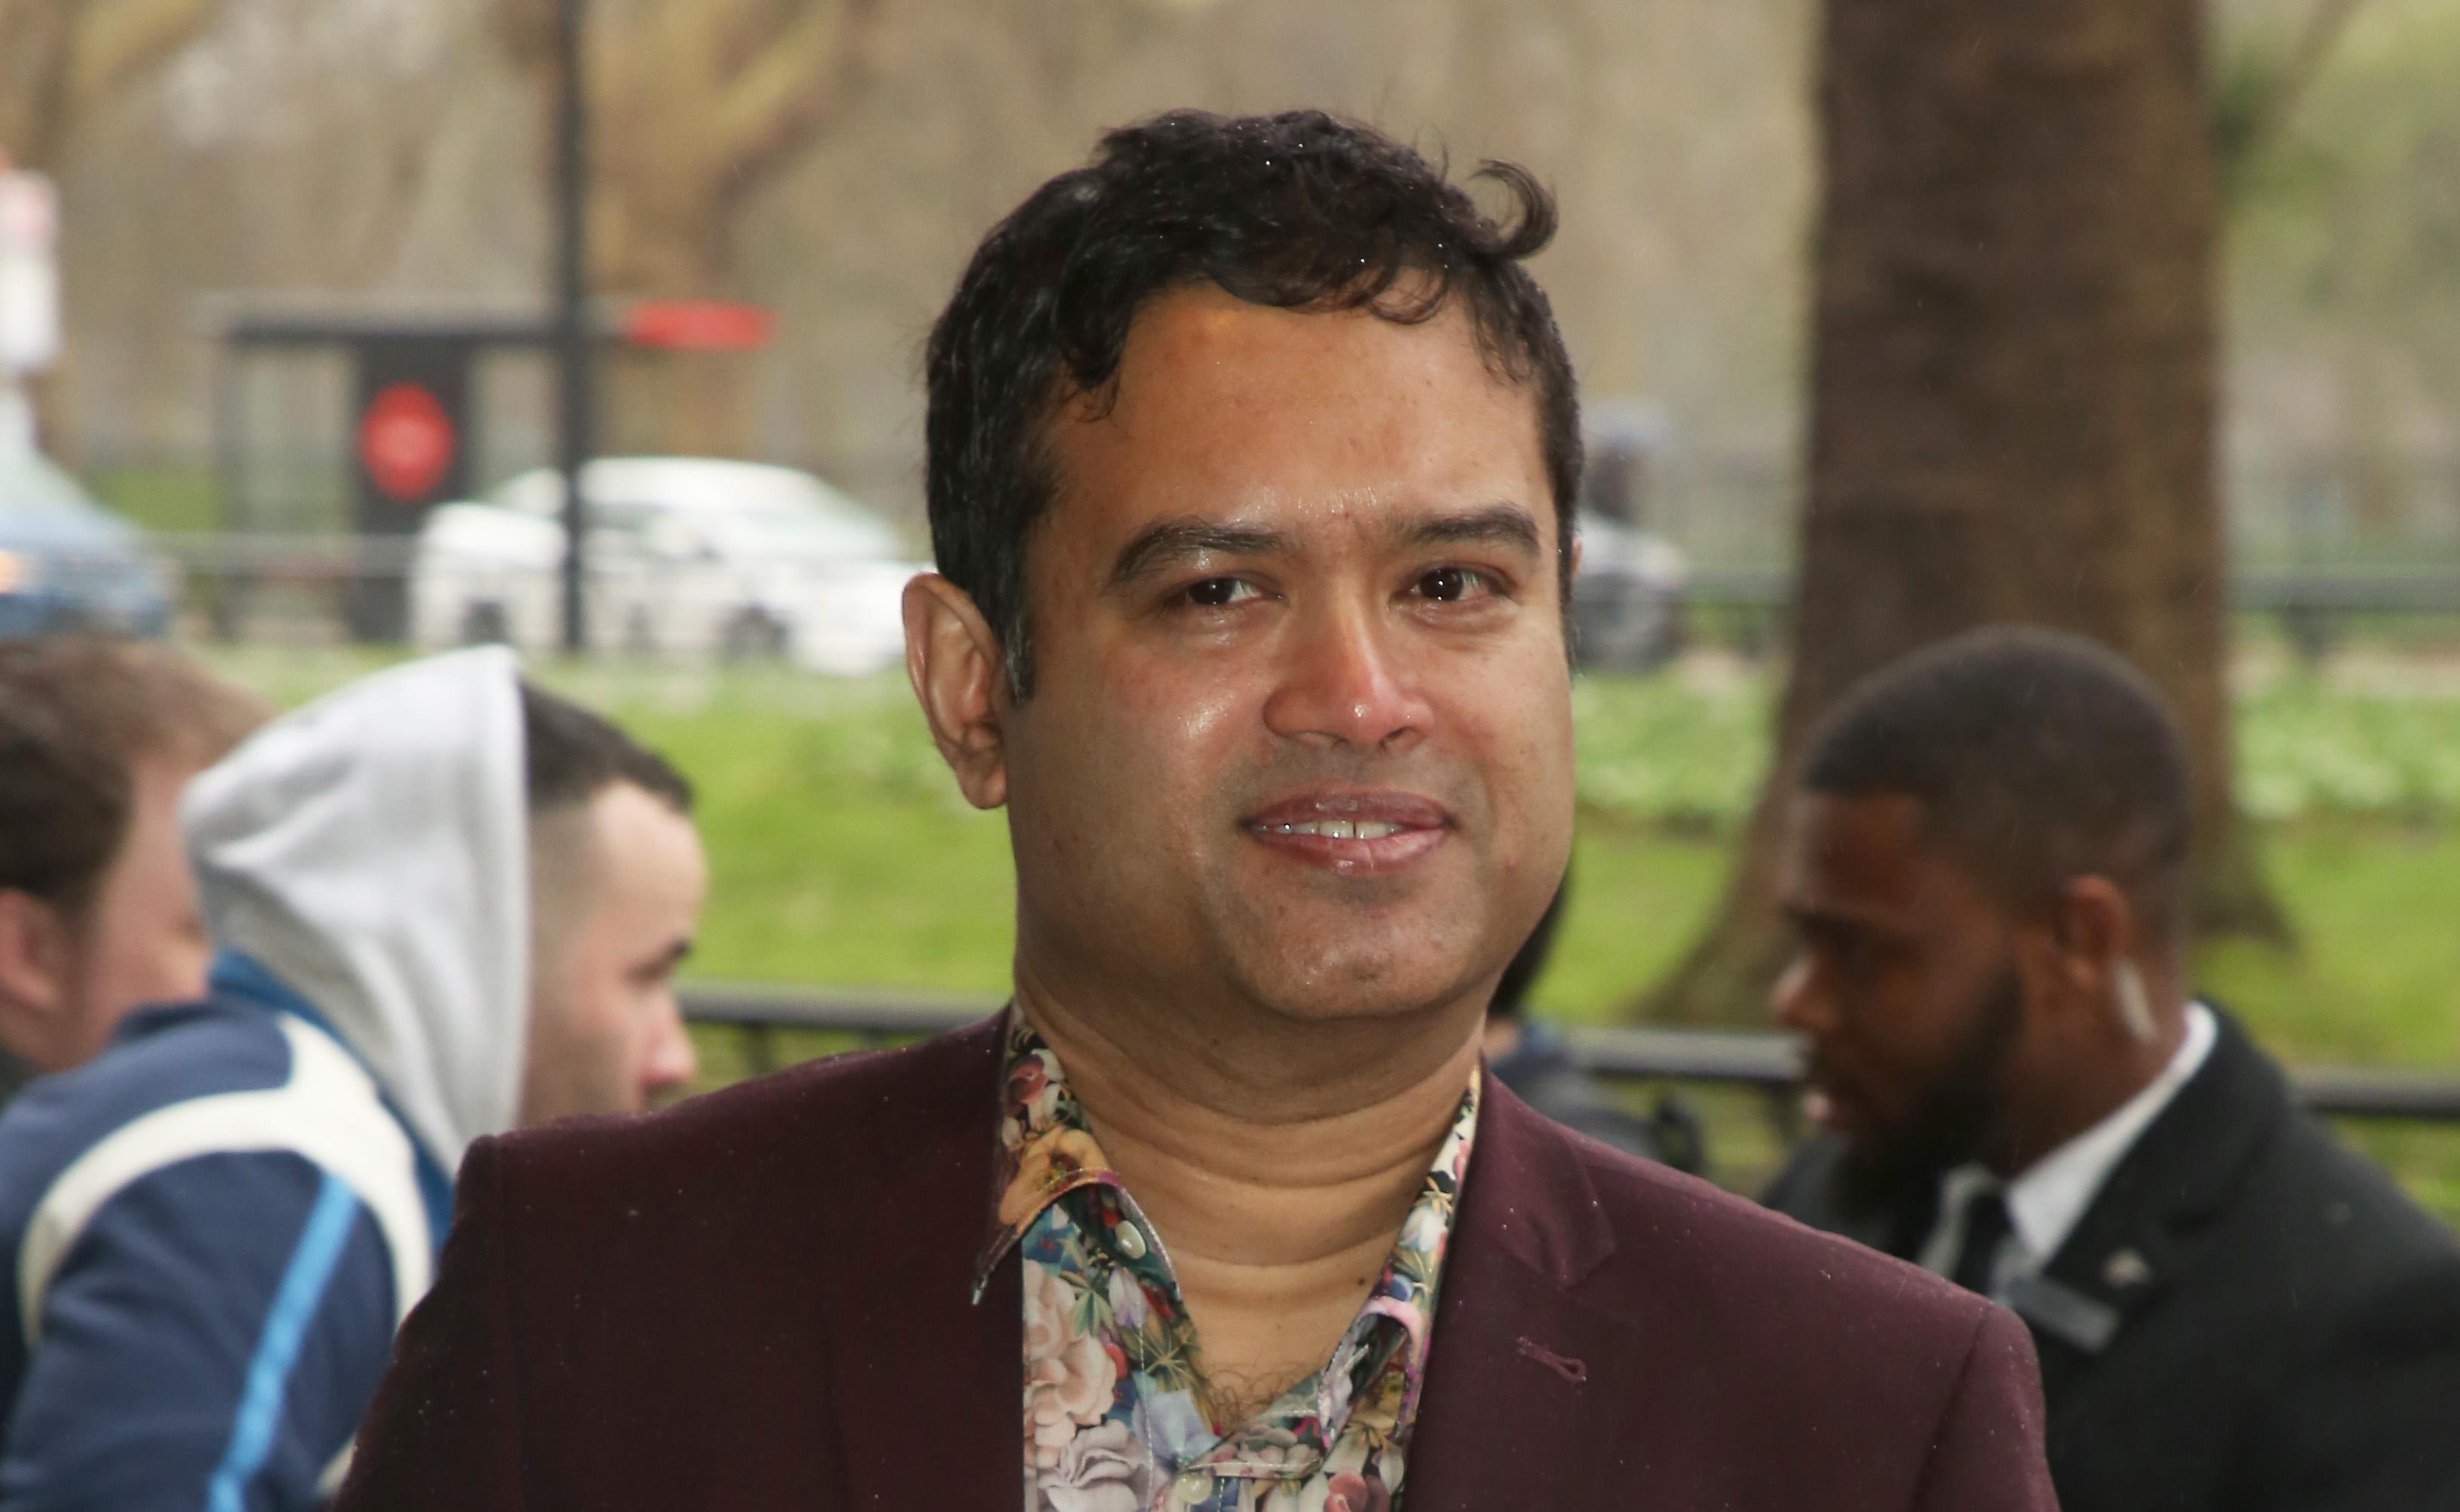 Paul Sinha suspects he has coronavirus and began self-isolating too late